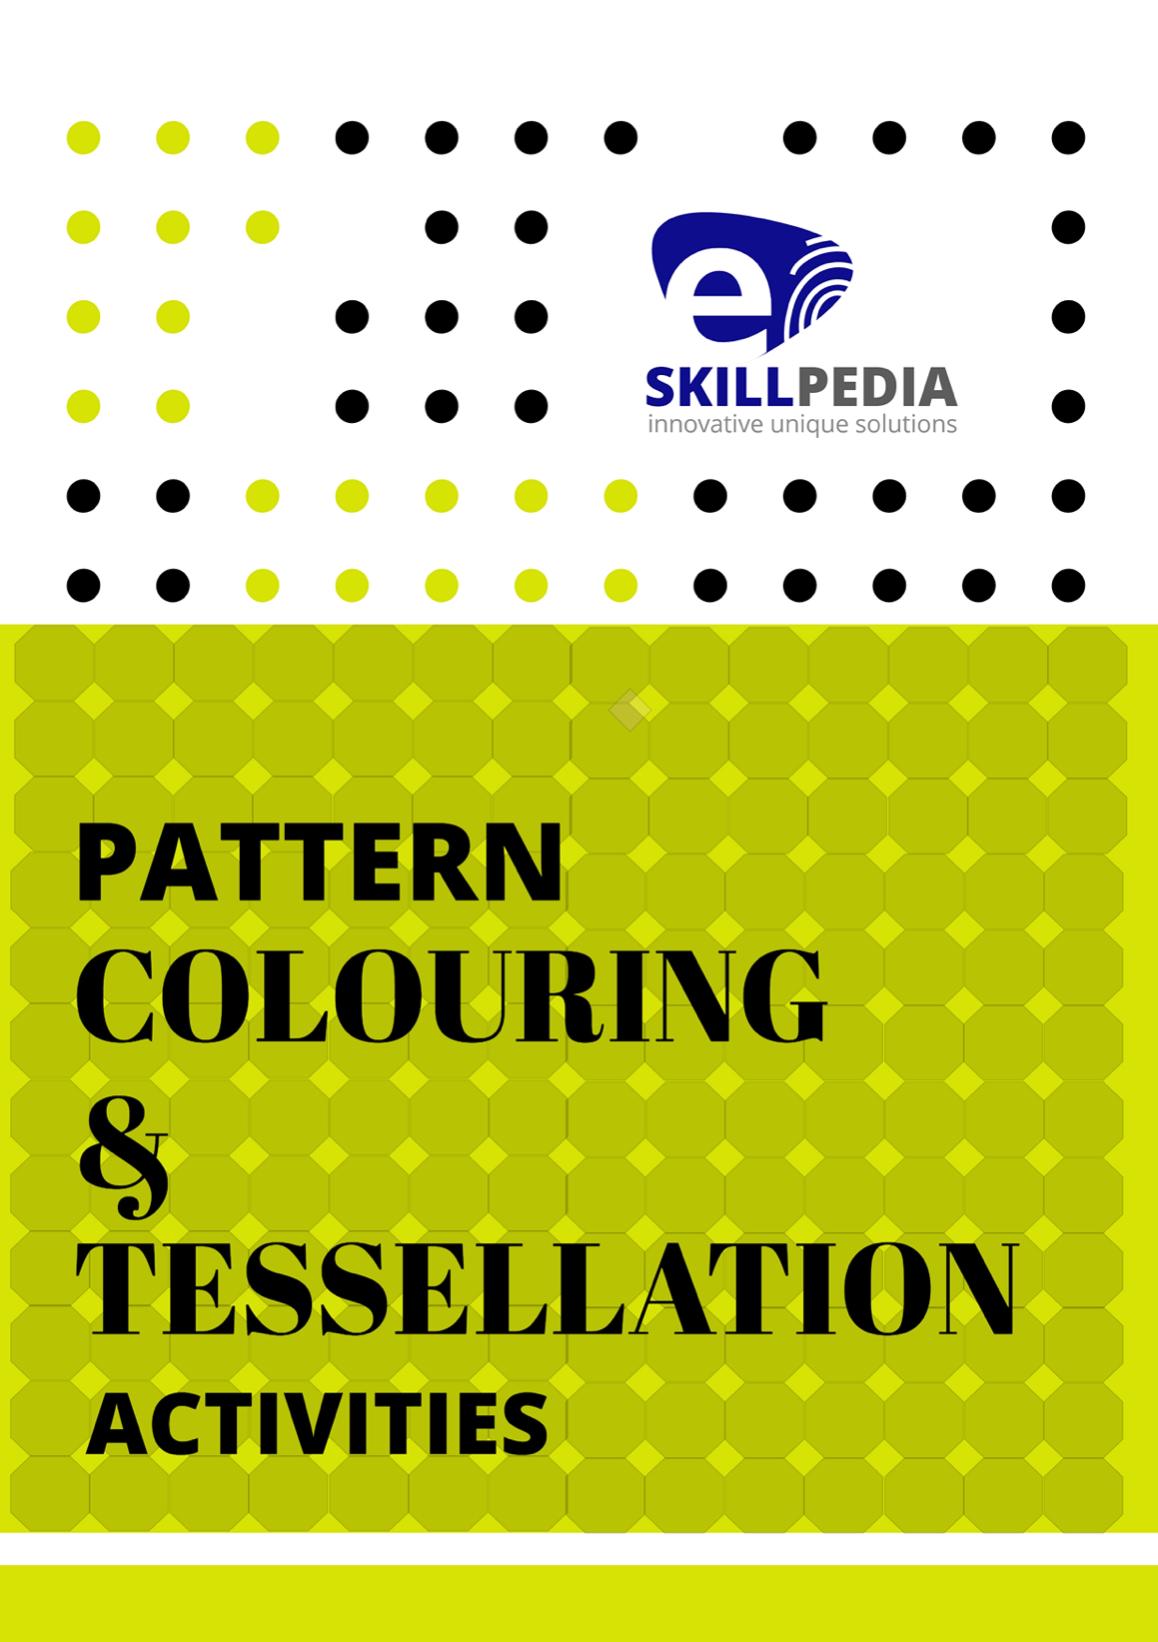 Pattern Colouring & Tessellation Activities